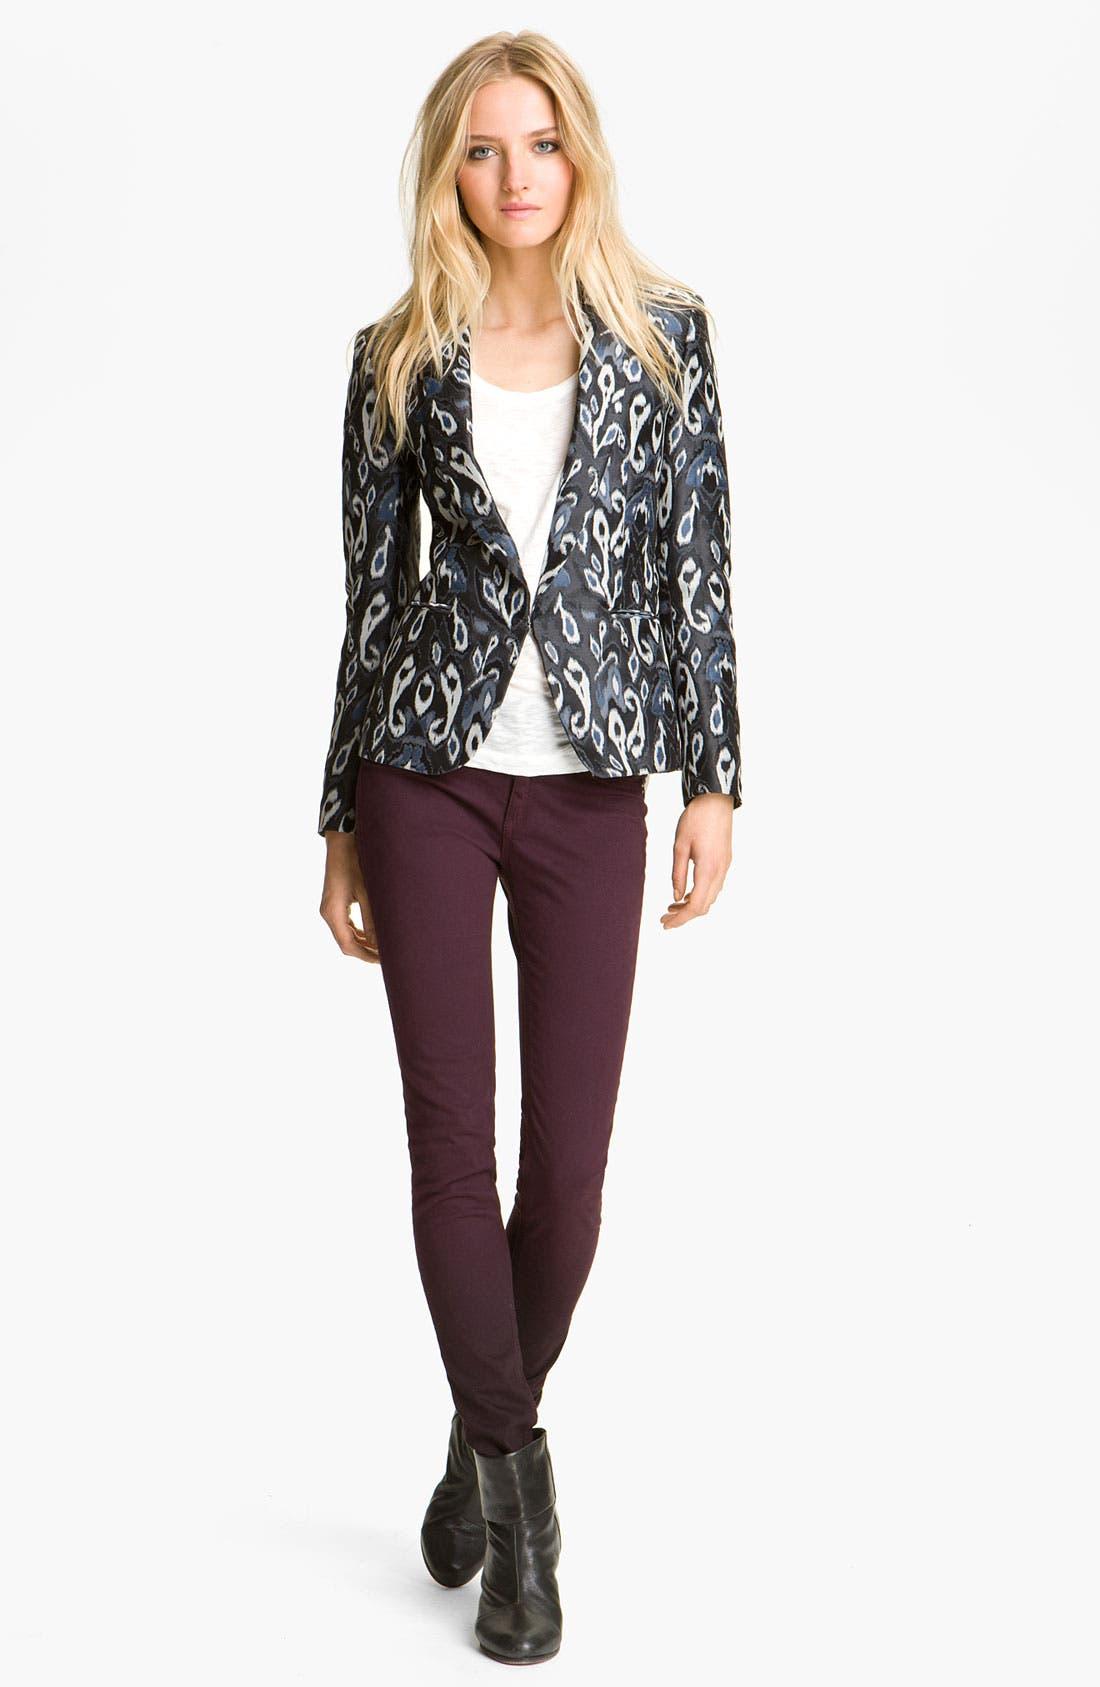 Alternate Image 1 Selected - rag & bone Ikat Print Tuxedo Jacket